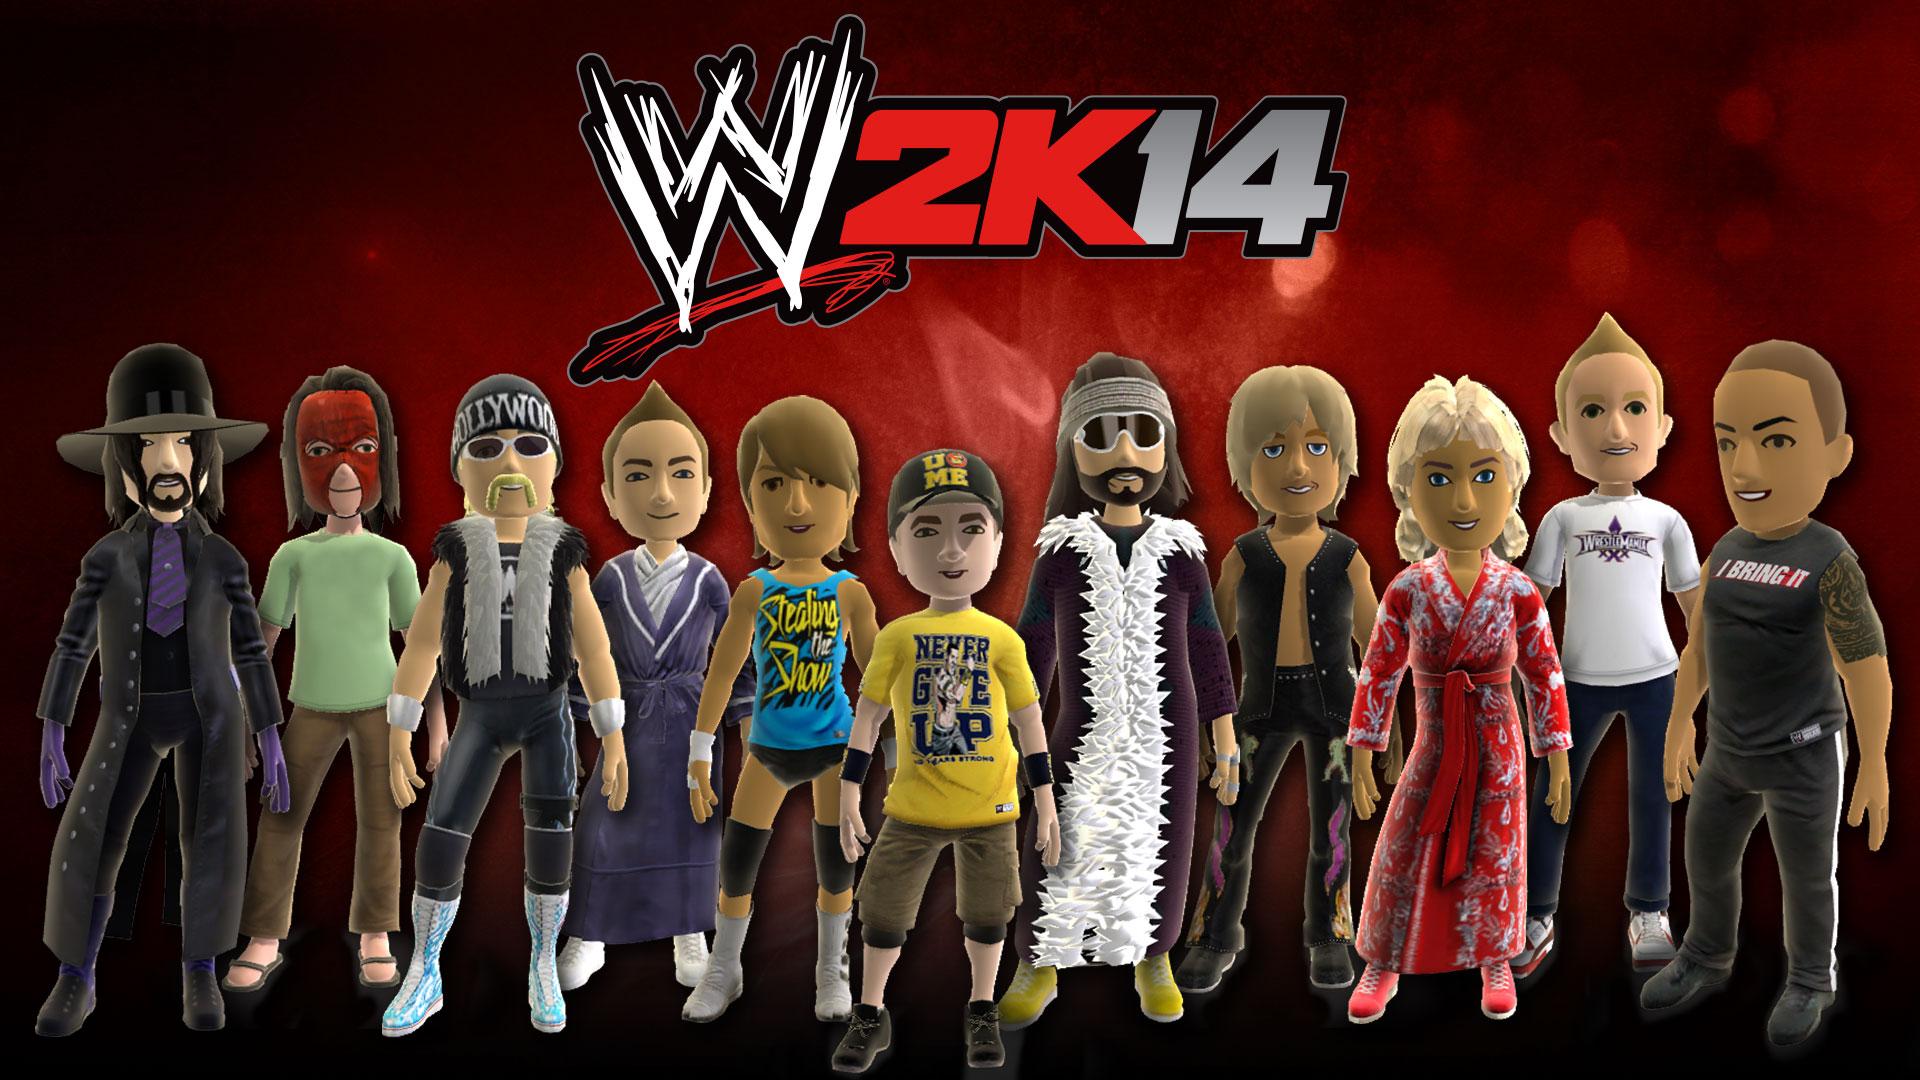 WWE 2K14 Dynamic Theme featuring The Rock, John Cena, Hulk Hogan